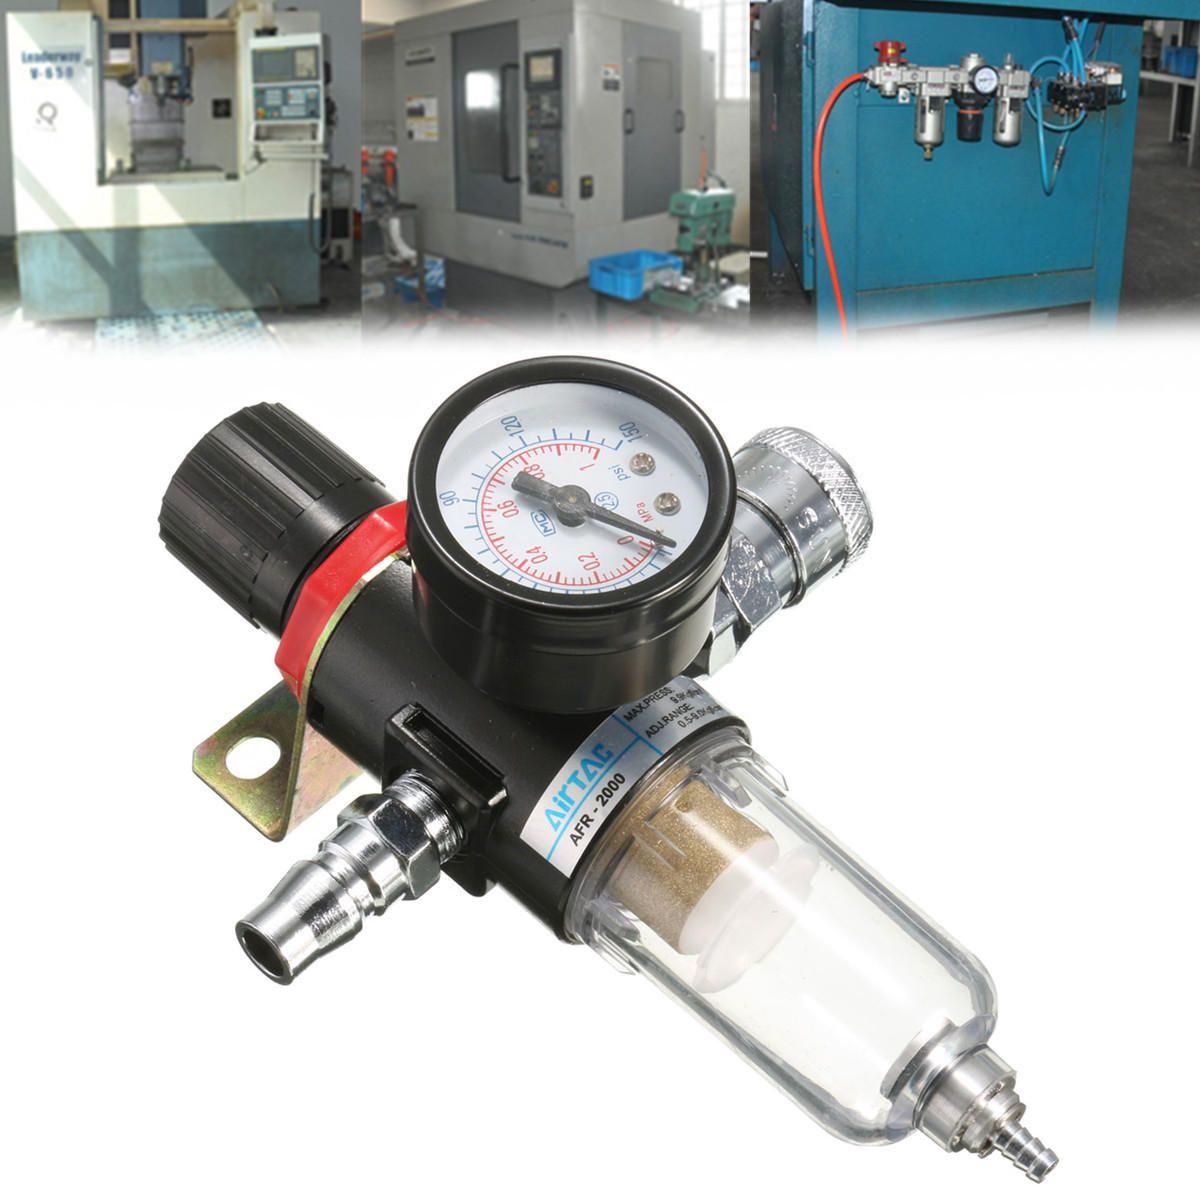 "AFR2000 1/4"" Air Compressor Filter Water Separator Trap"